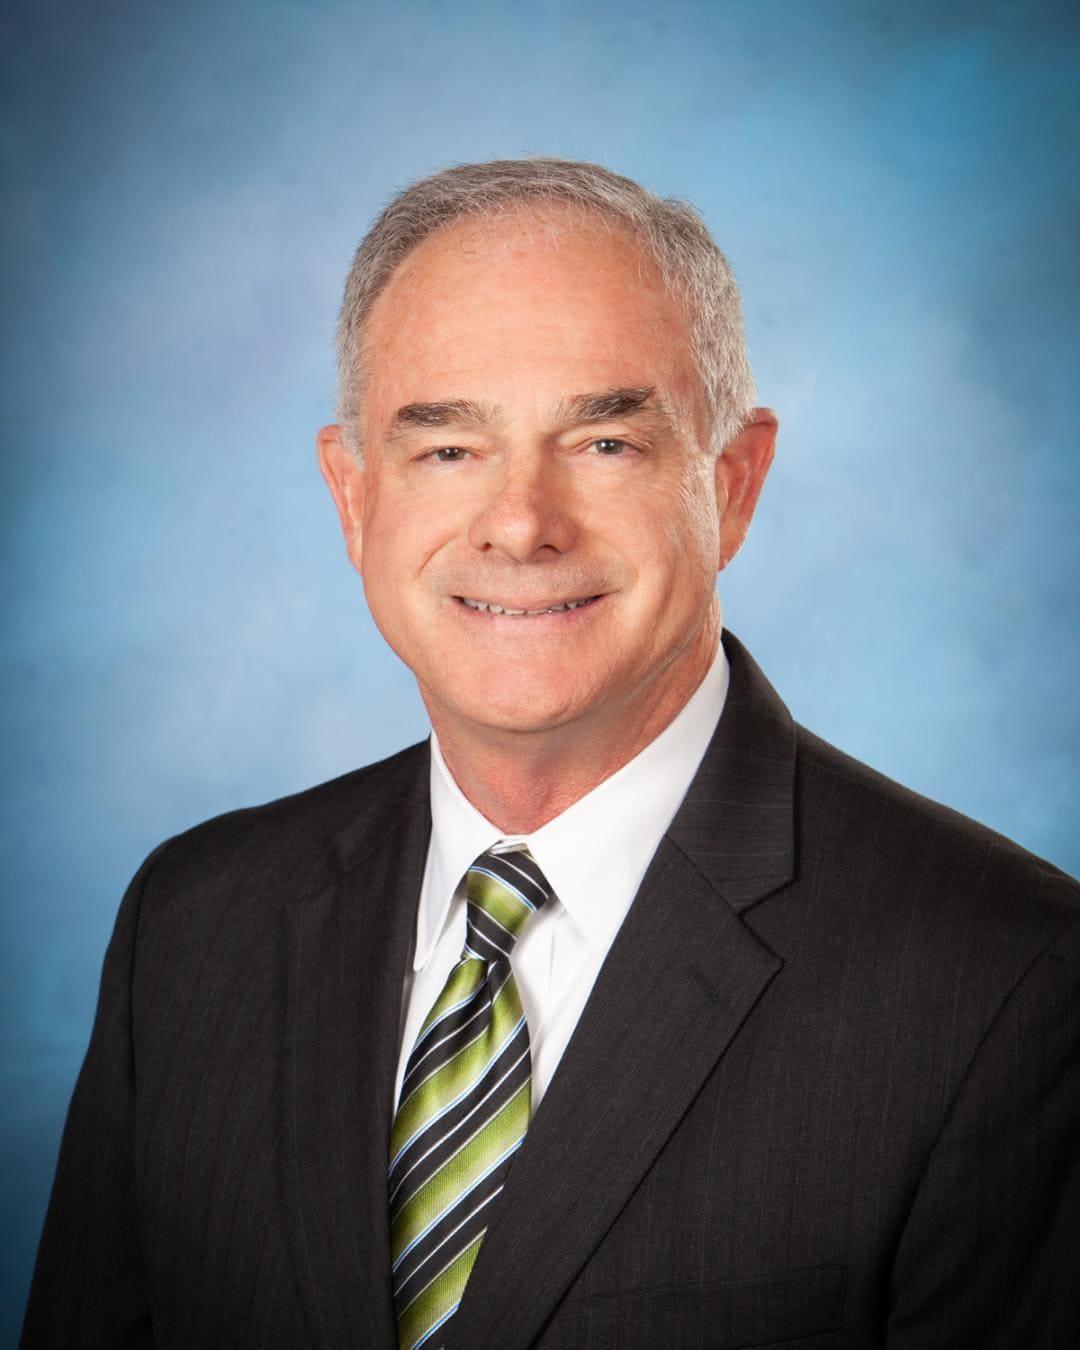 Duncanville City Manager